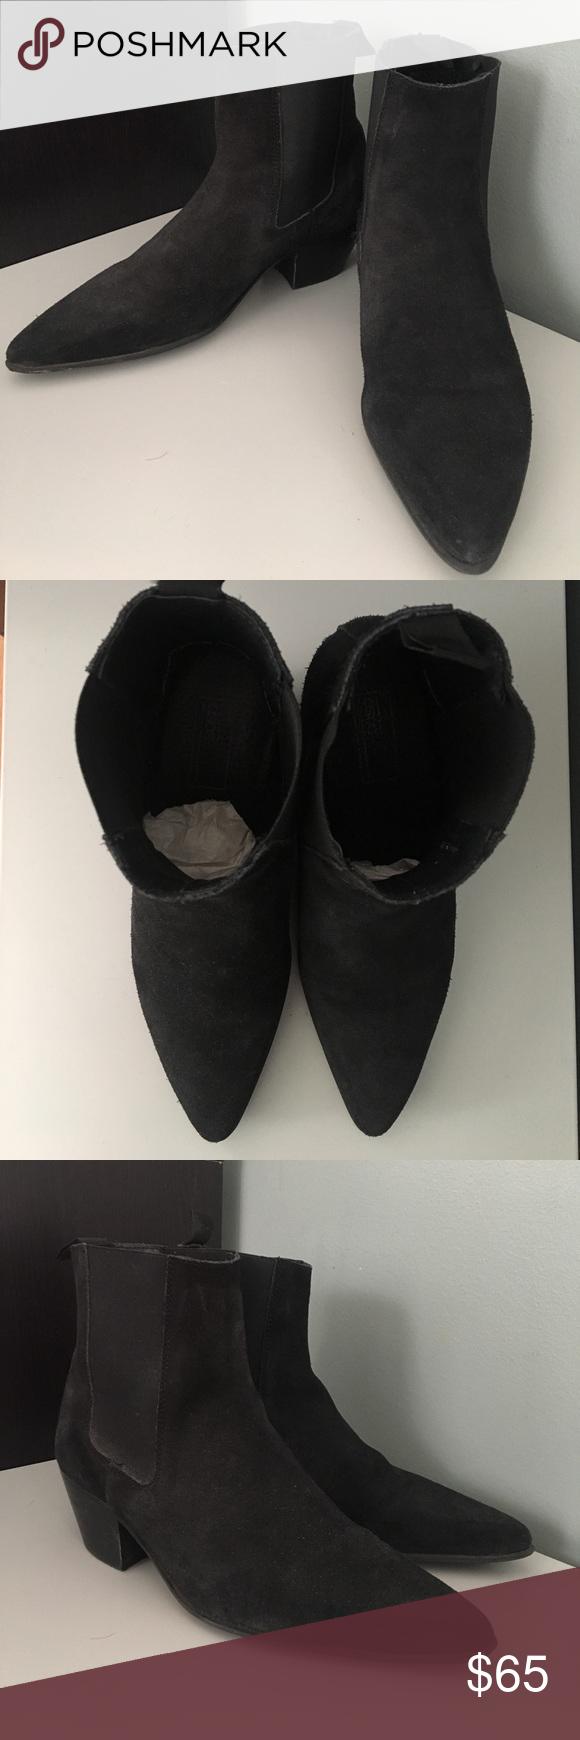 asos chelsea boots in black suede w stacked heel pinterest